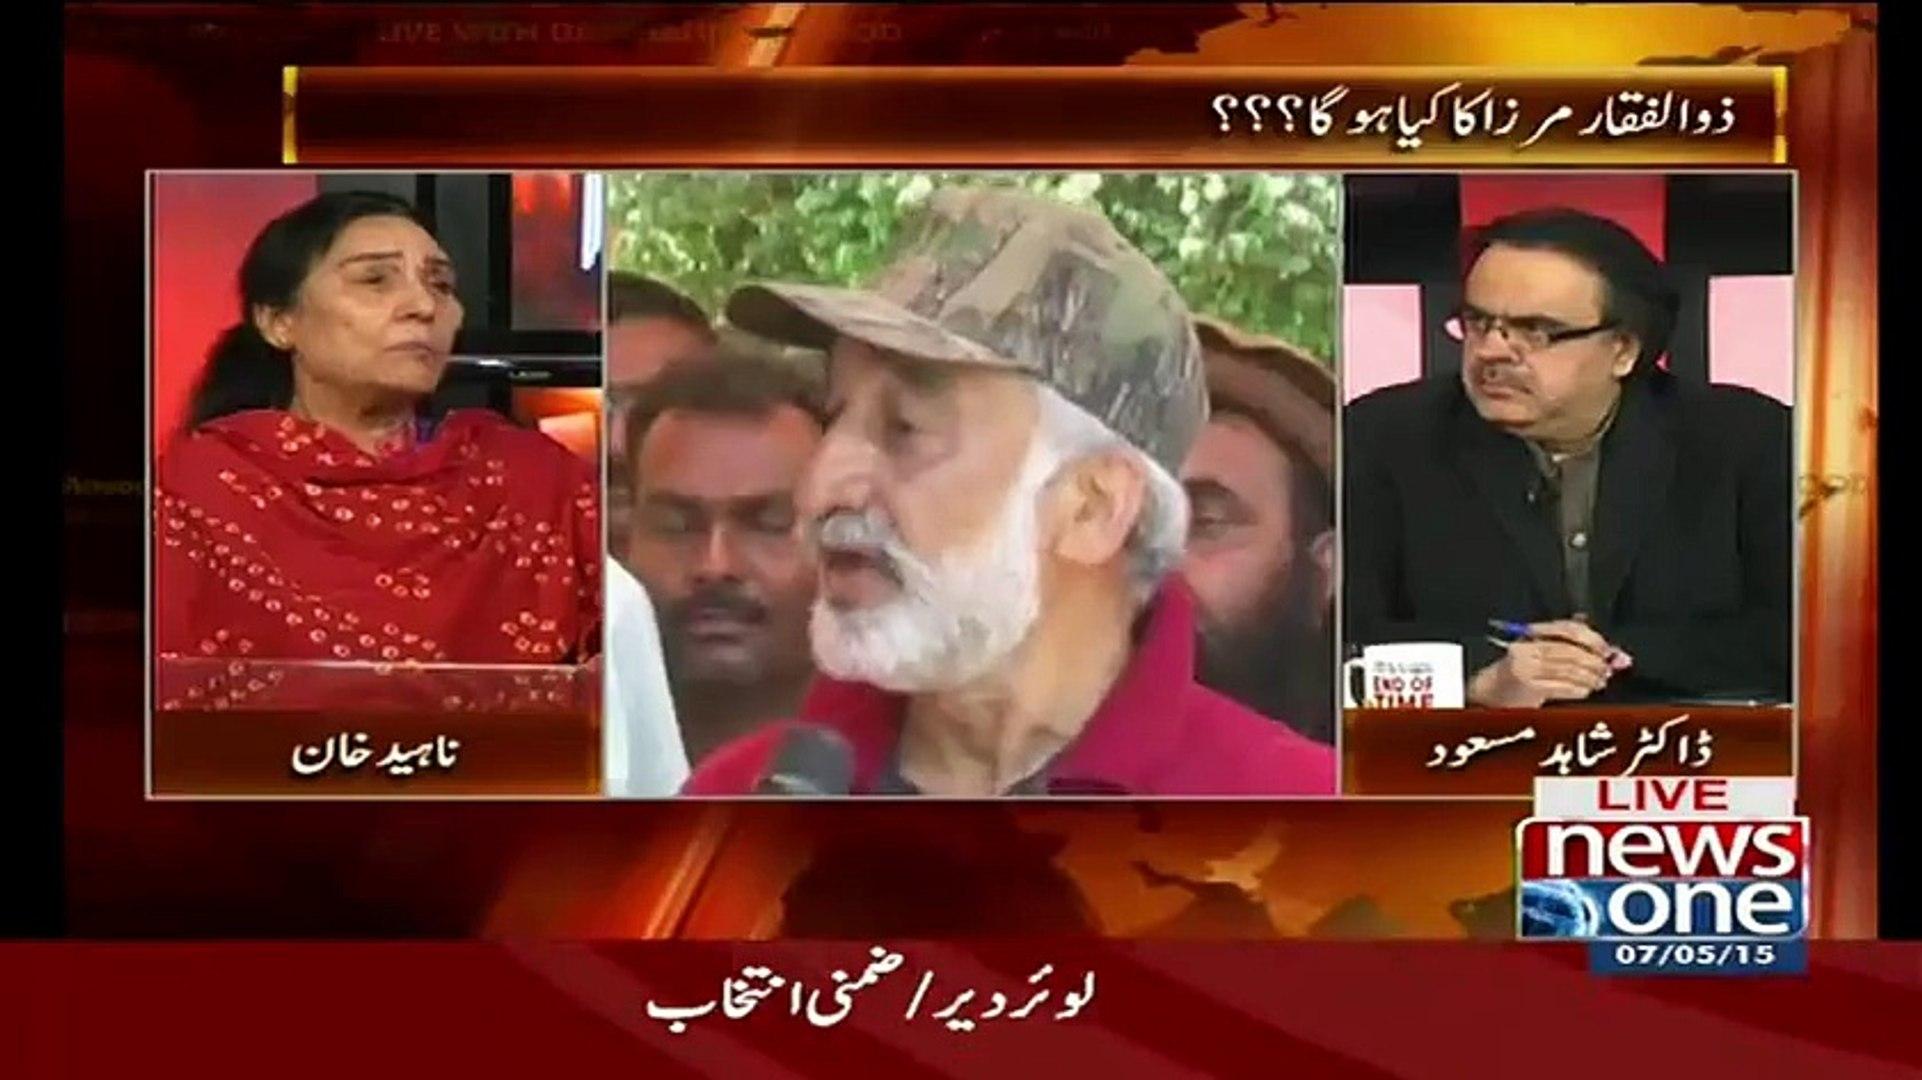 Direct Indirect Naheed Khan Ne Bol Dia Ke Zulfiqar Mirza Thek Bolrahe Hain..Dr Shahid Masood